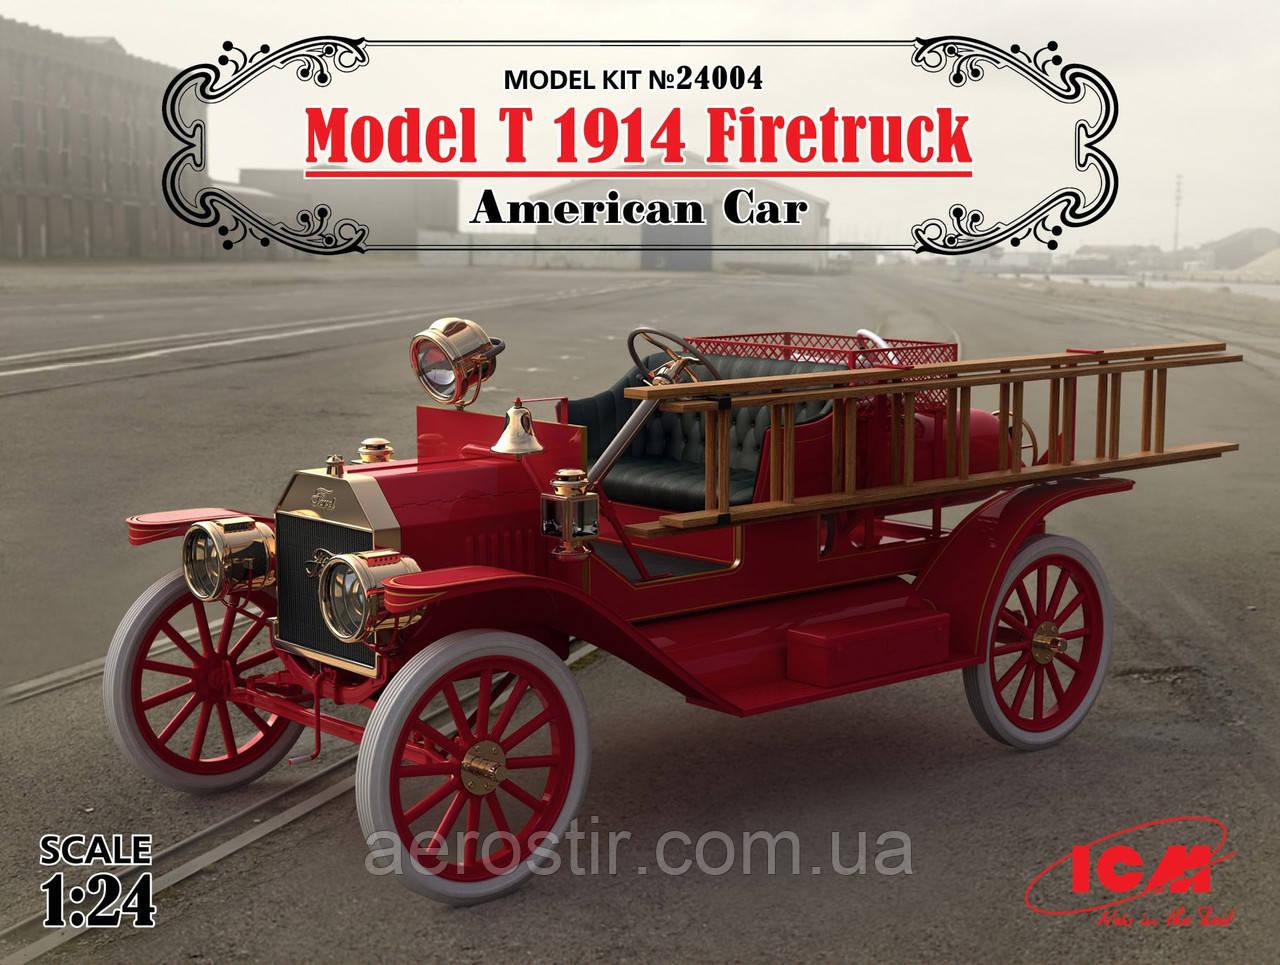 Model T 1914 Firetruek 1/24 ICM 24004